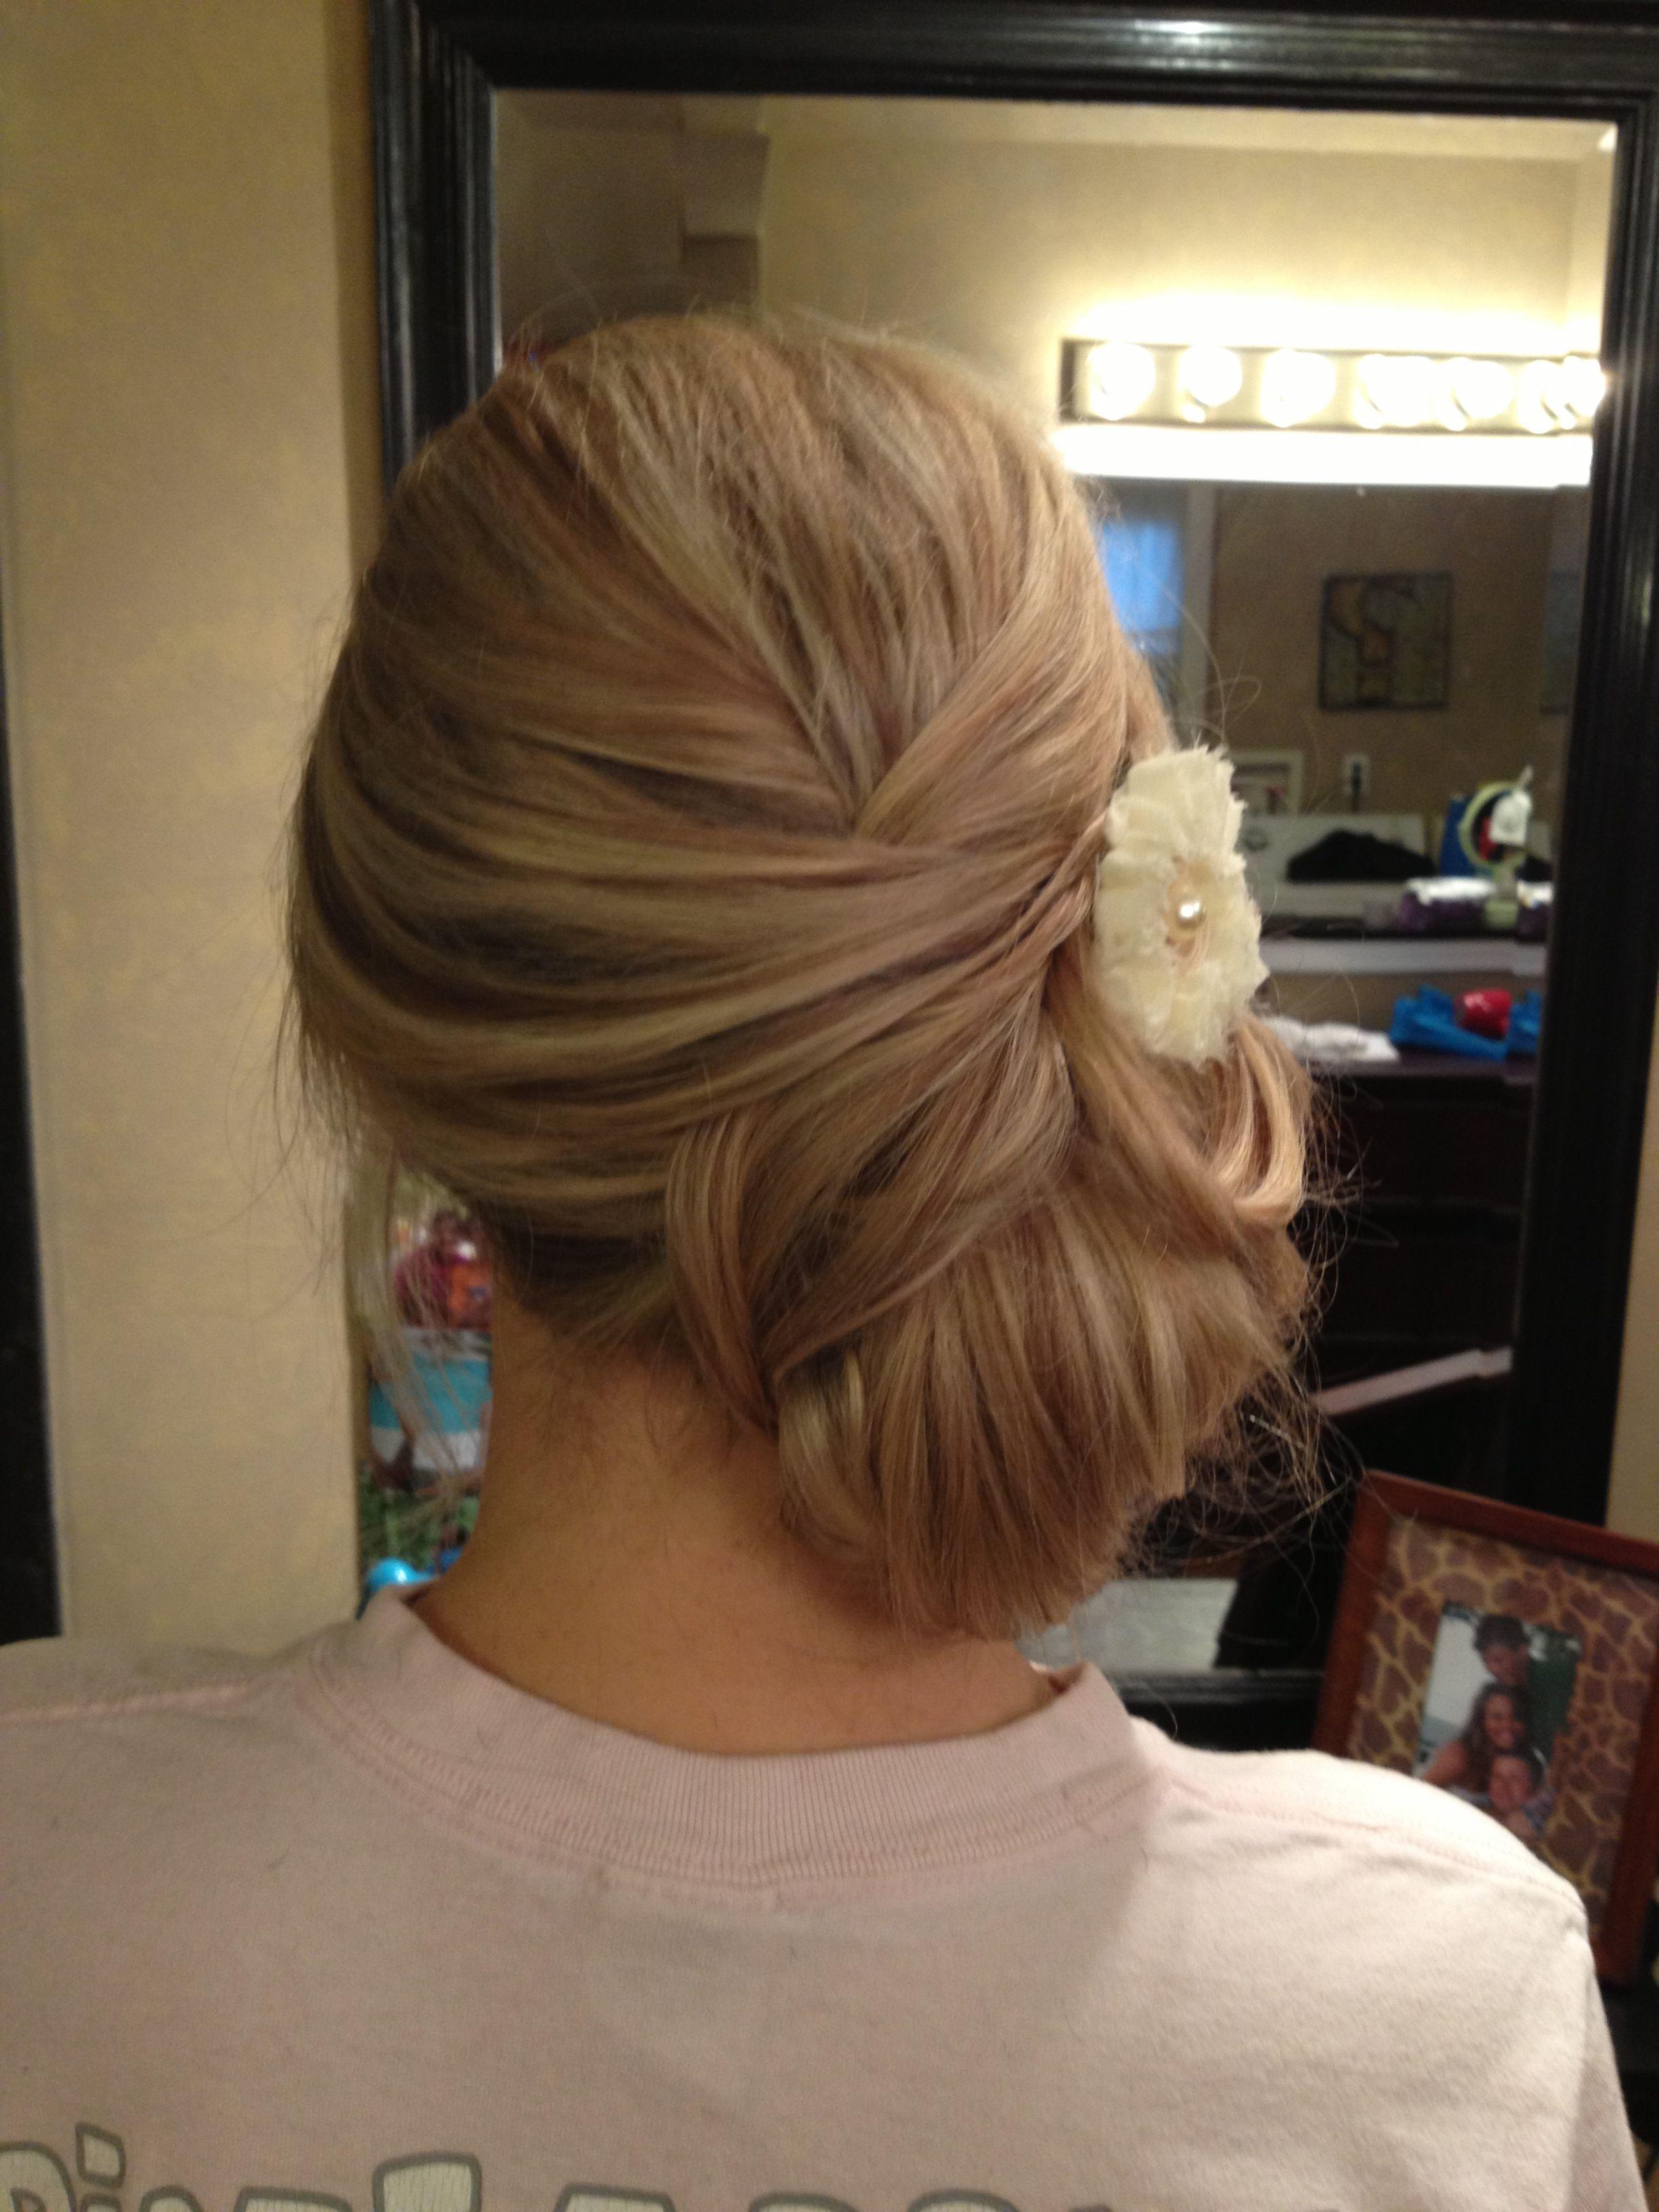 loose side bun wedding upd-stylist patti knick | my favs